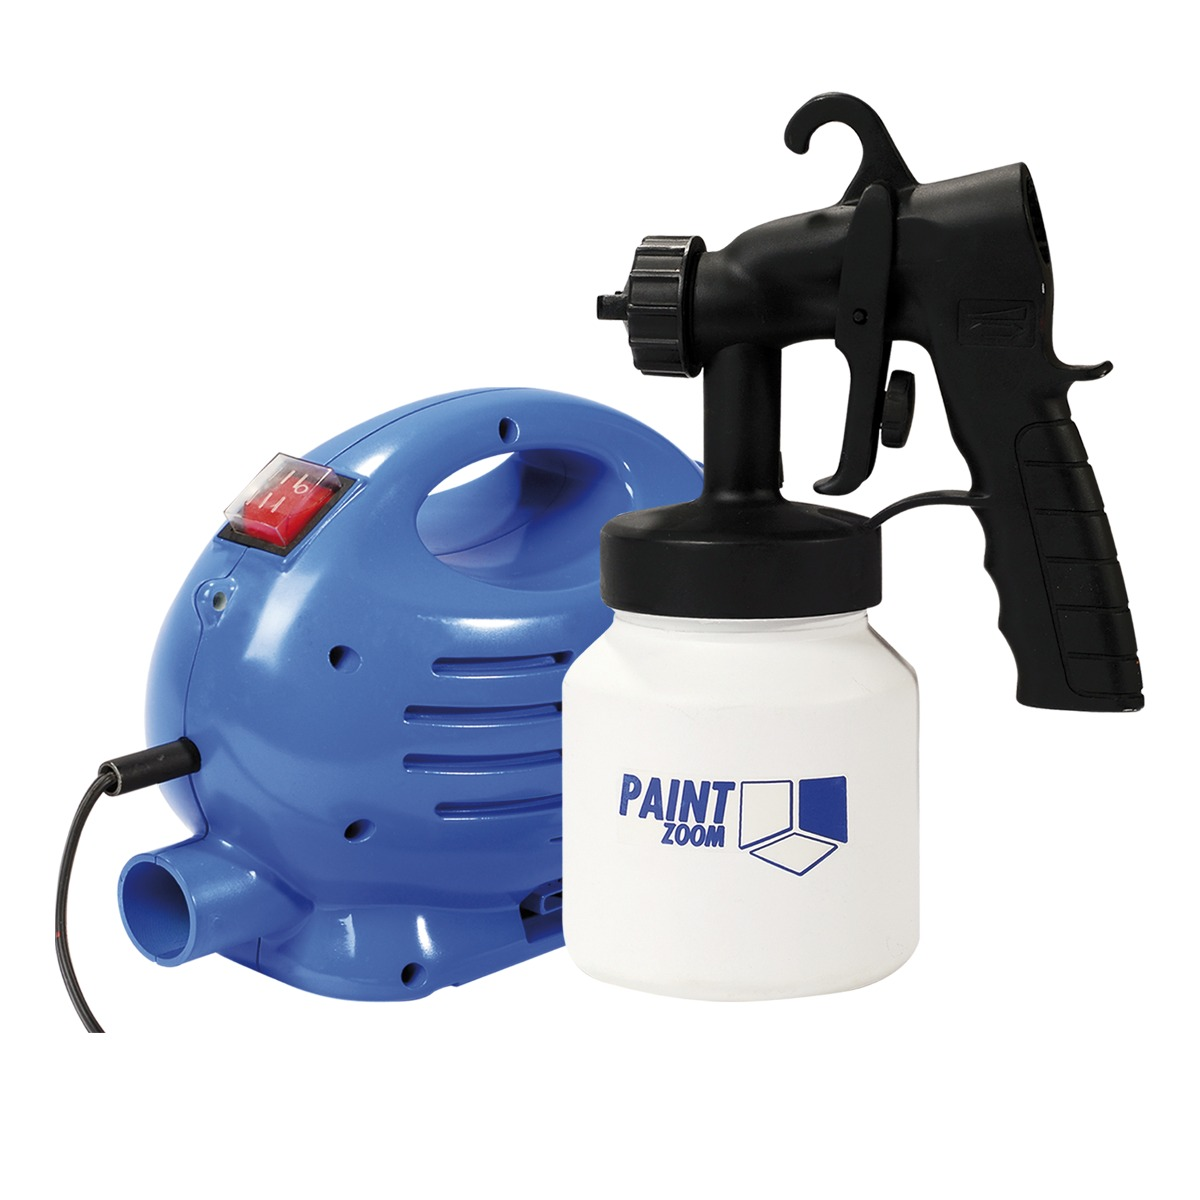 Pistola para pintura com compressor portatil frete gr tis - Pistola pintura compresor ...